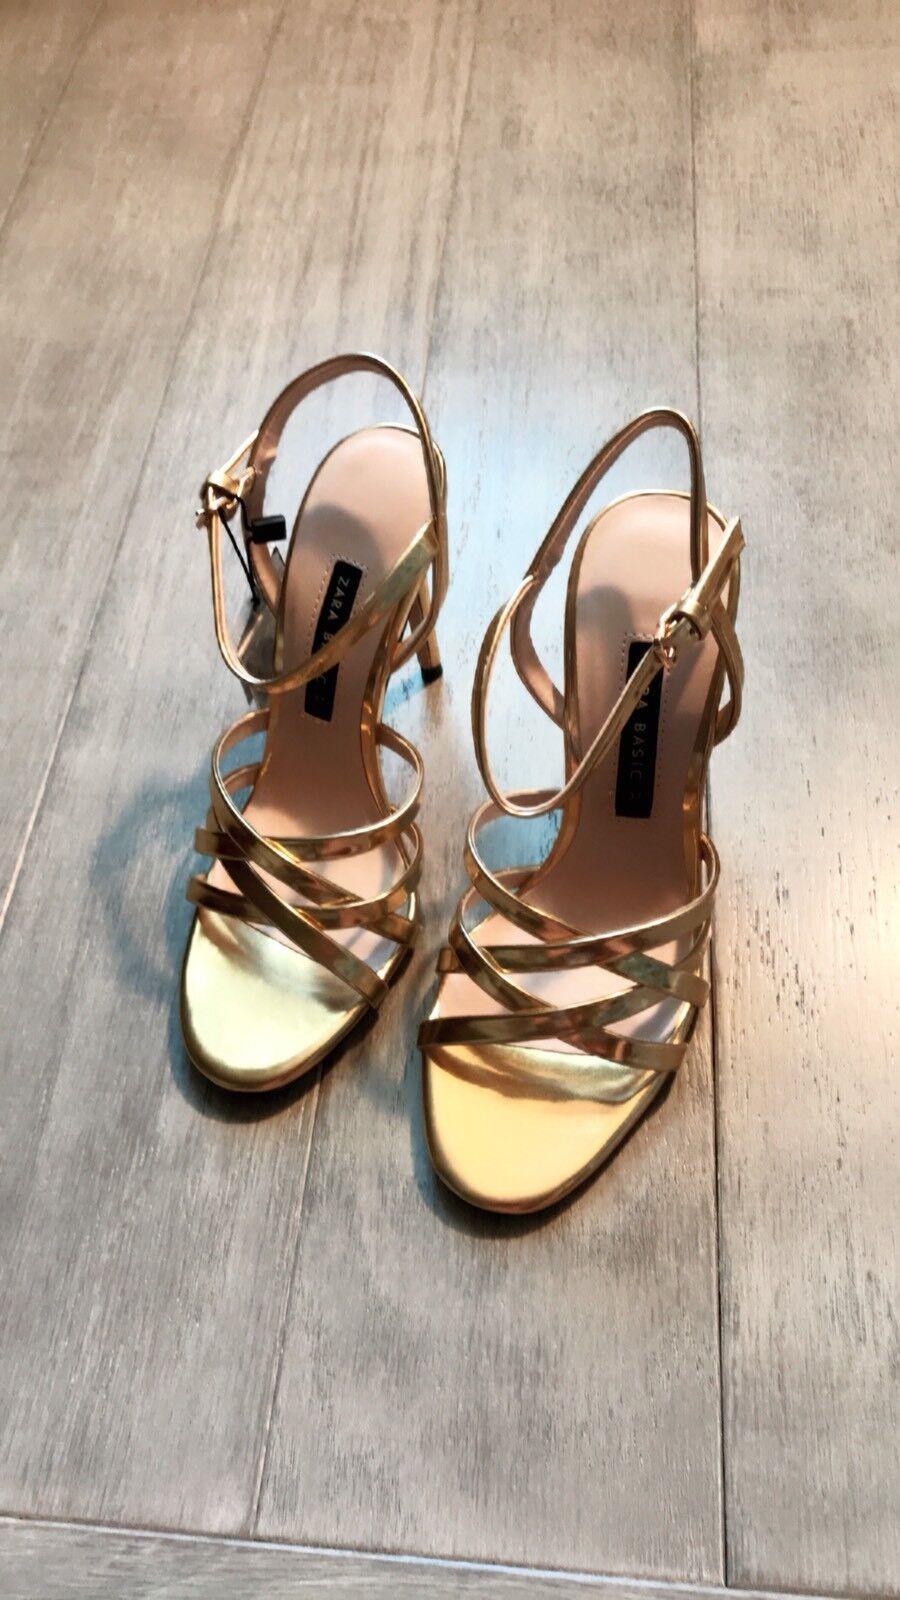 ZARA Women's Laminated Strappy Sandals(gold, US 6.5, 7.5 )